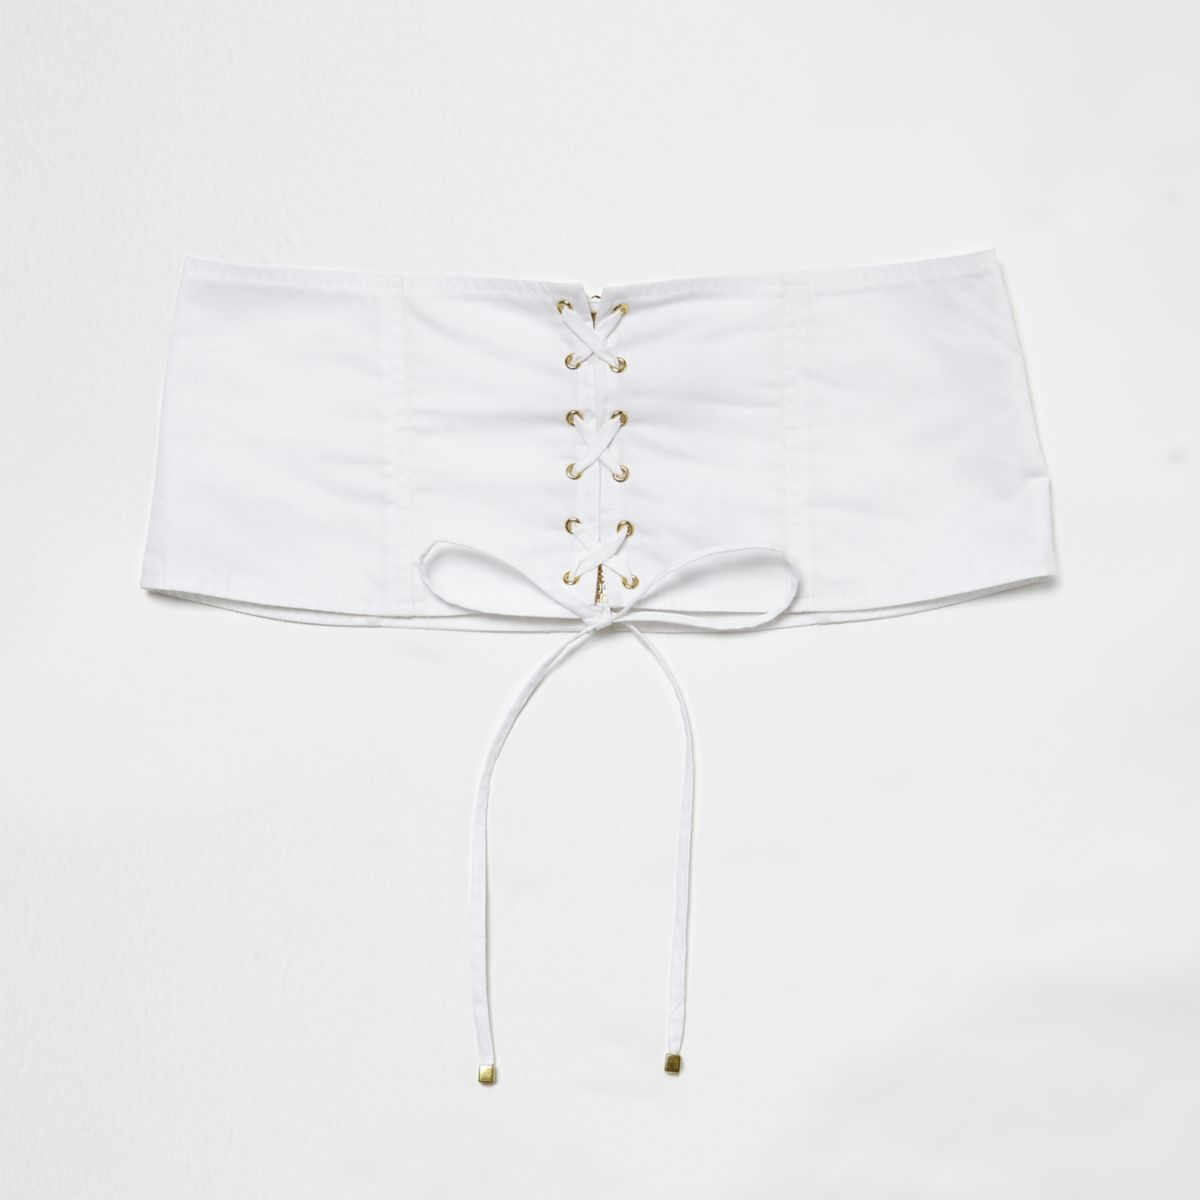 White poplin lace-up corset waist belt